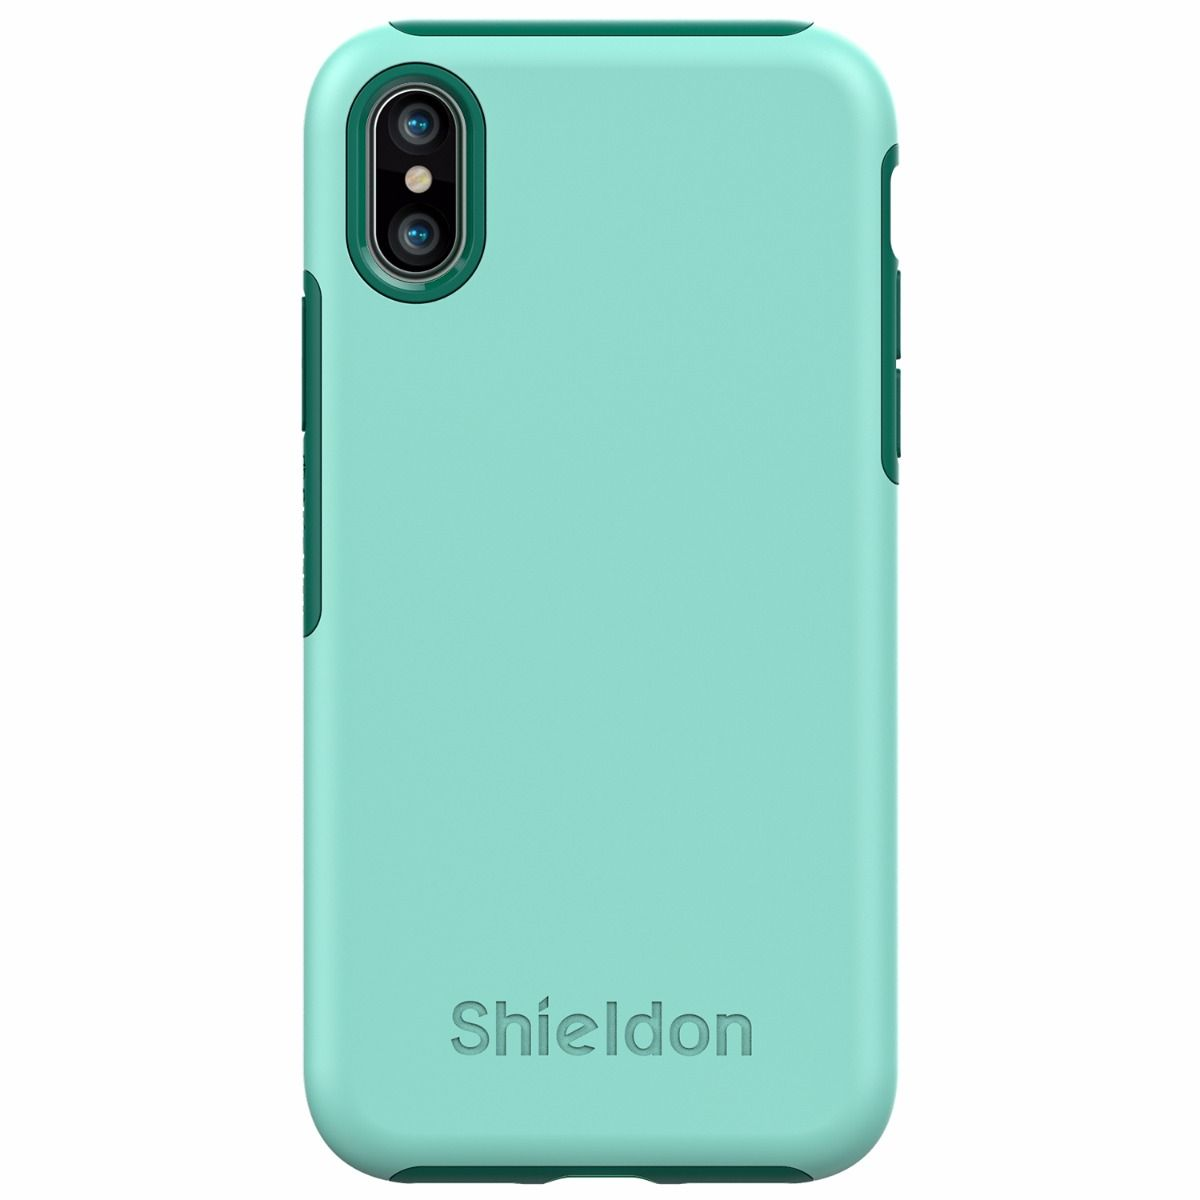 Shieldon Iphone